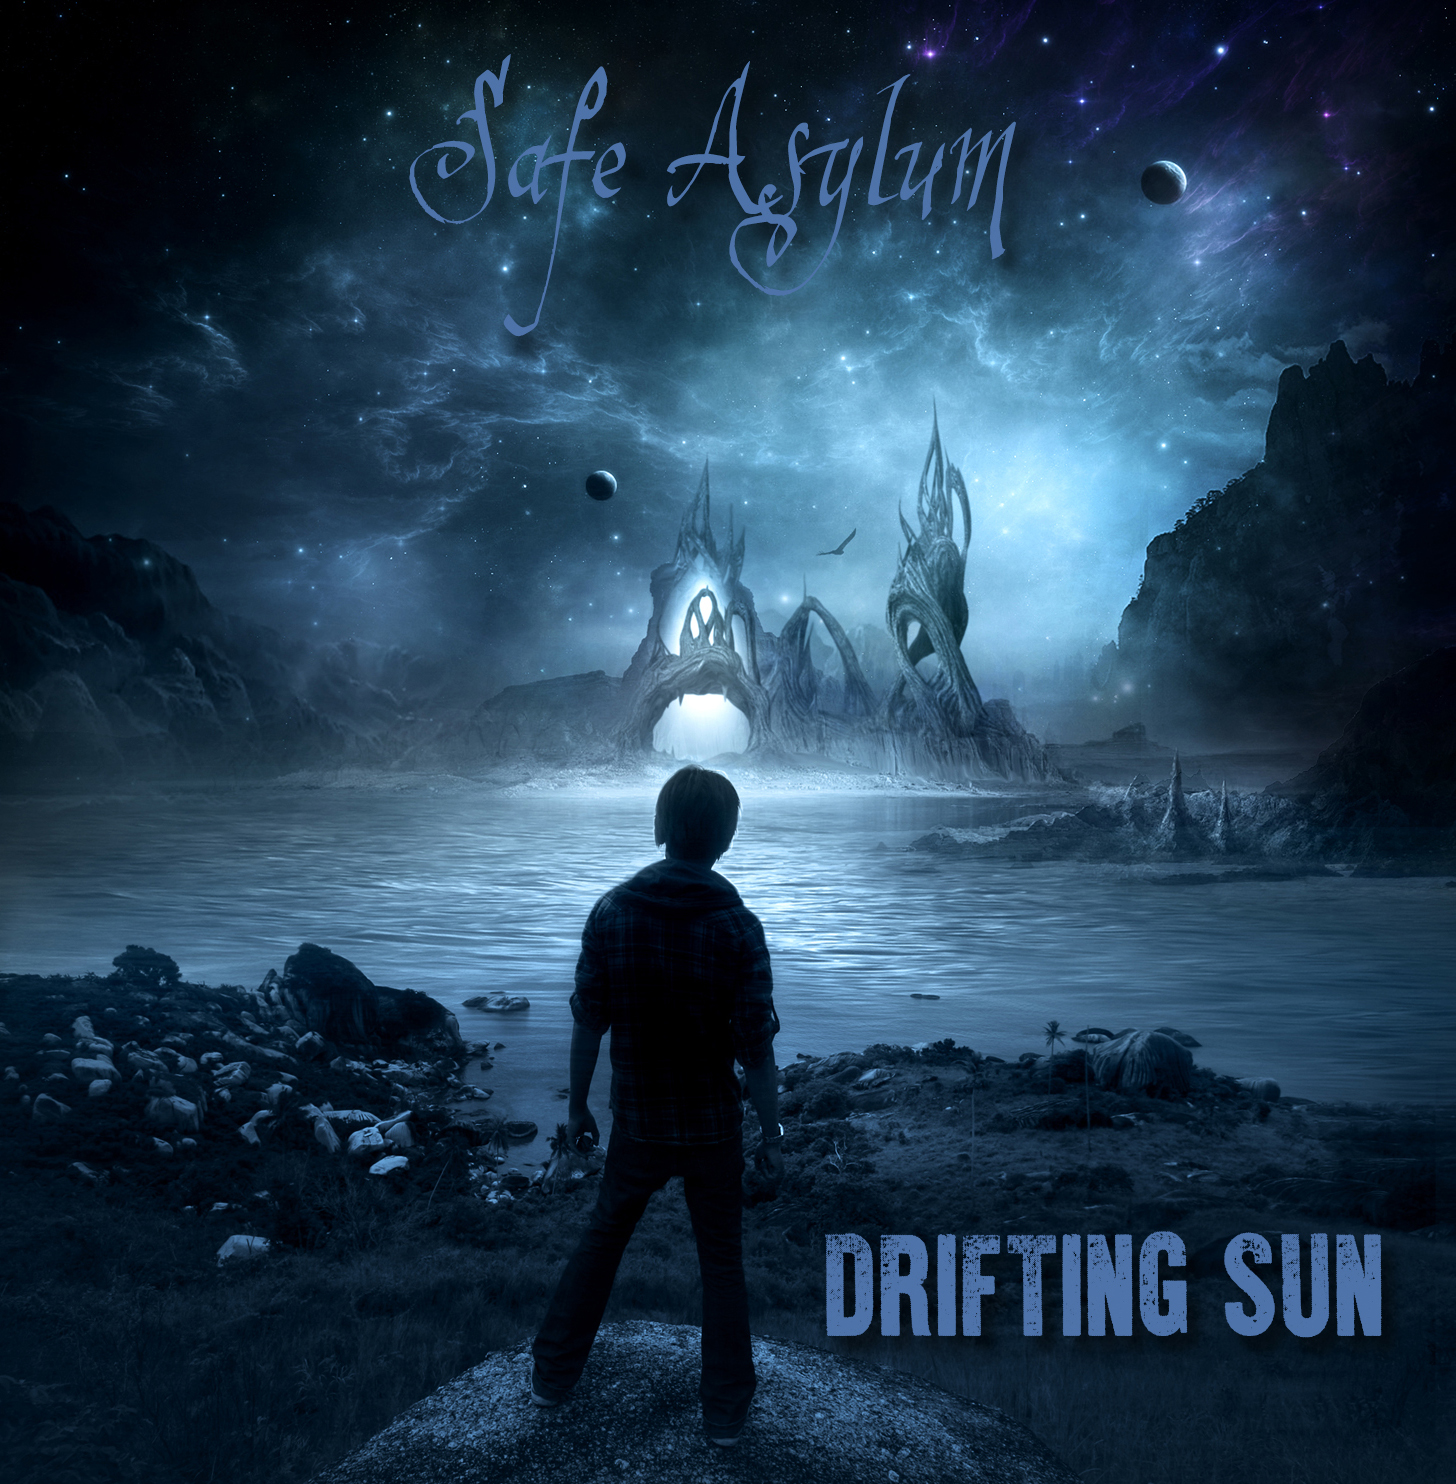 Drifting Sun - Safe Asylum - CD | MBM Music Buy Mail